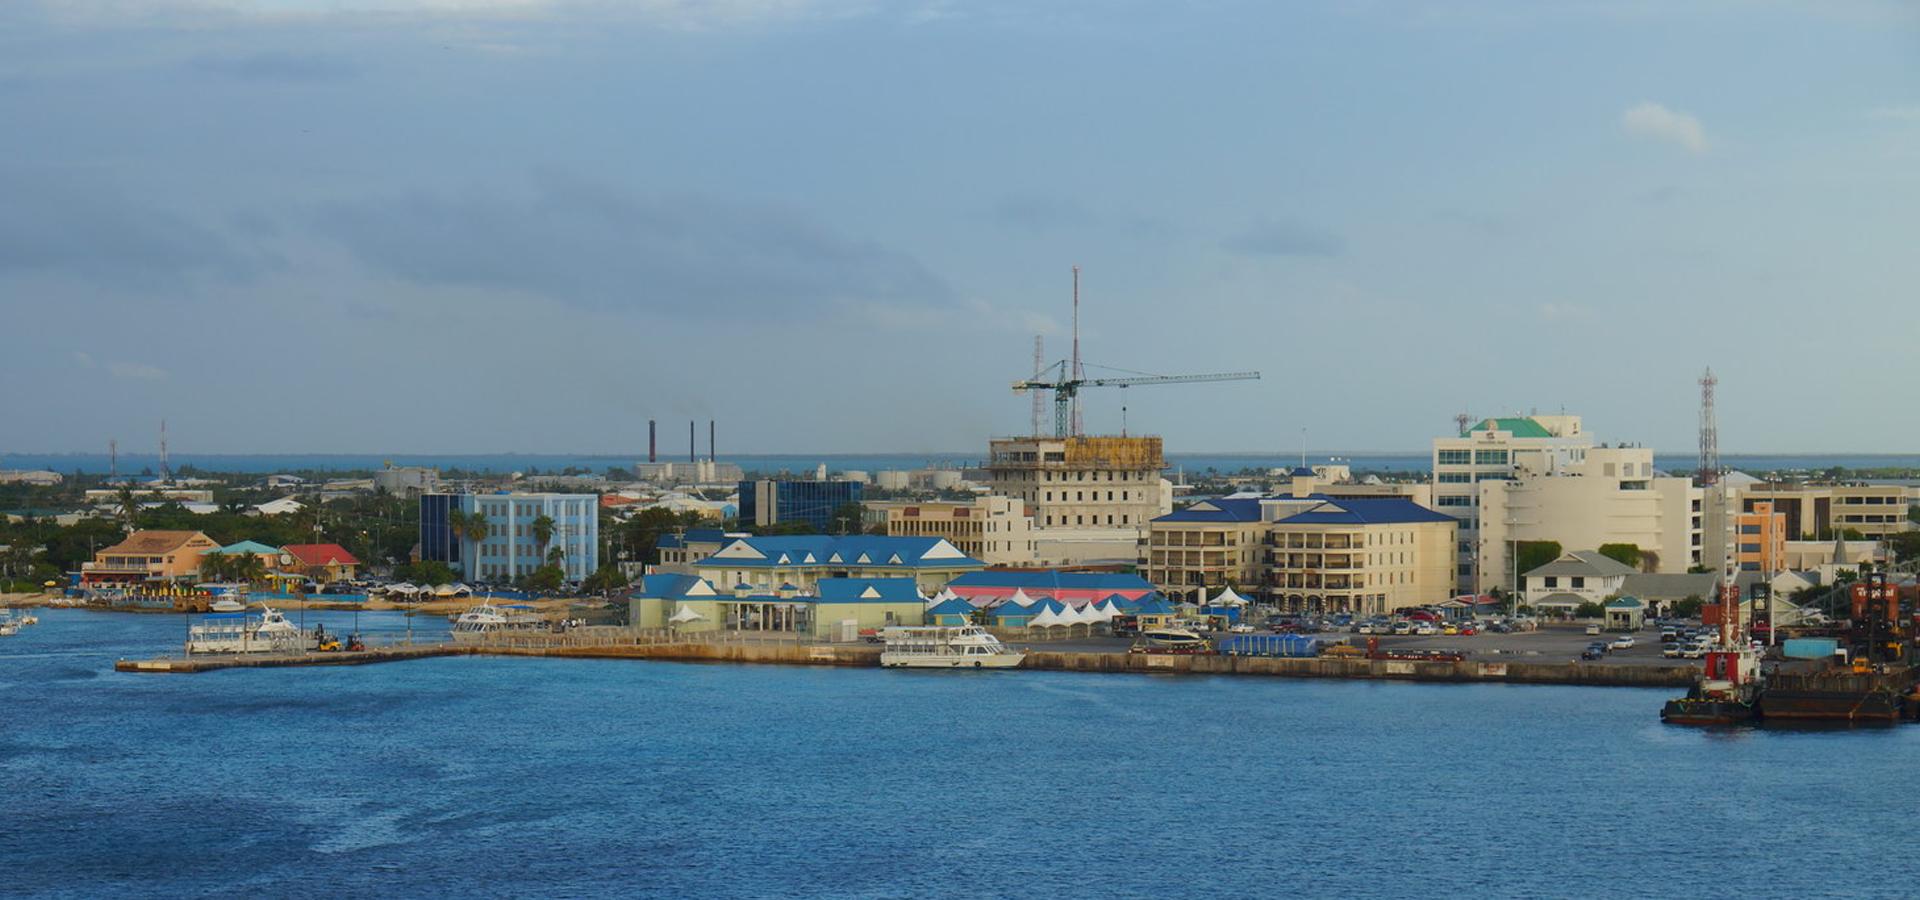 George Town, Spot Bay, Cayman Islands